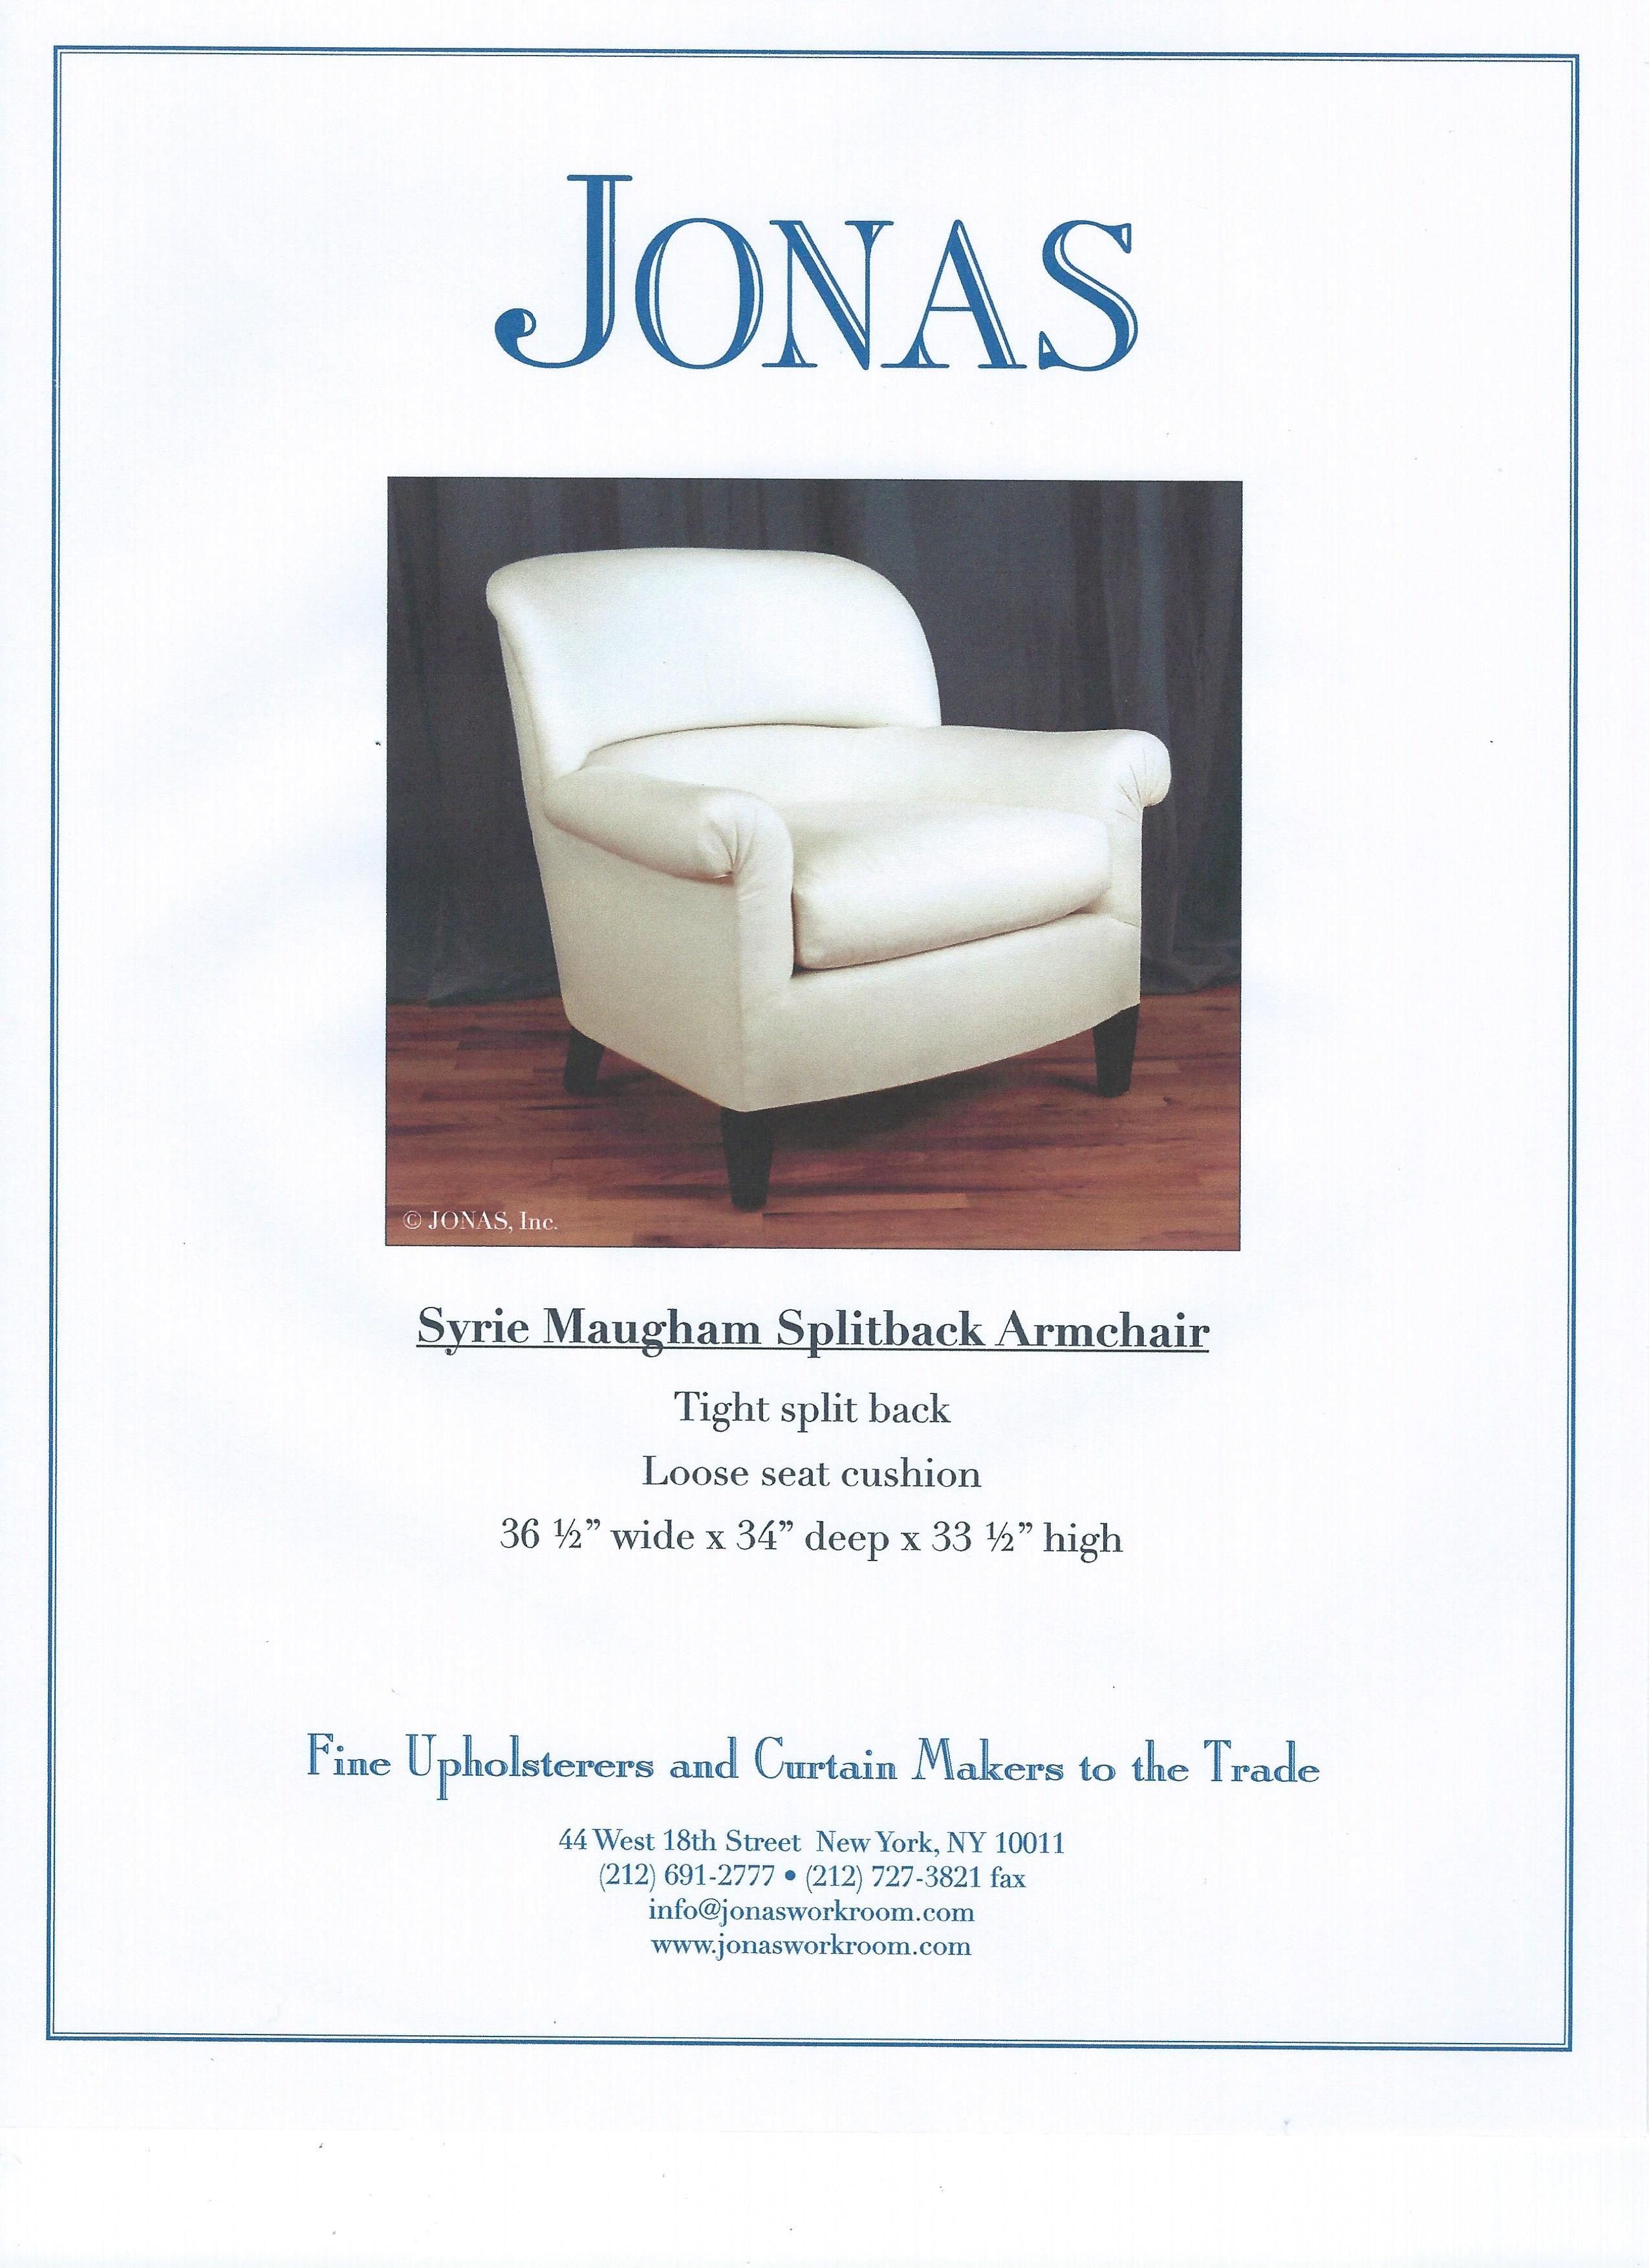 Syrie Maugham chair, Jonas | DWS Livingroom chairs | Pinterest